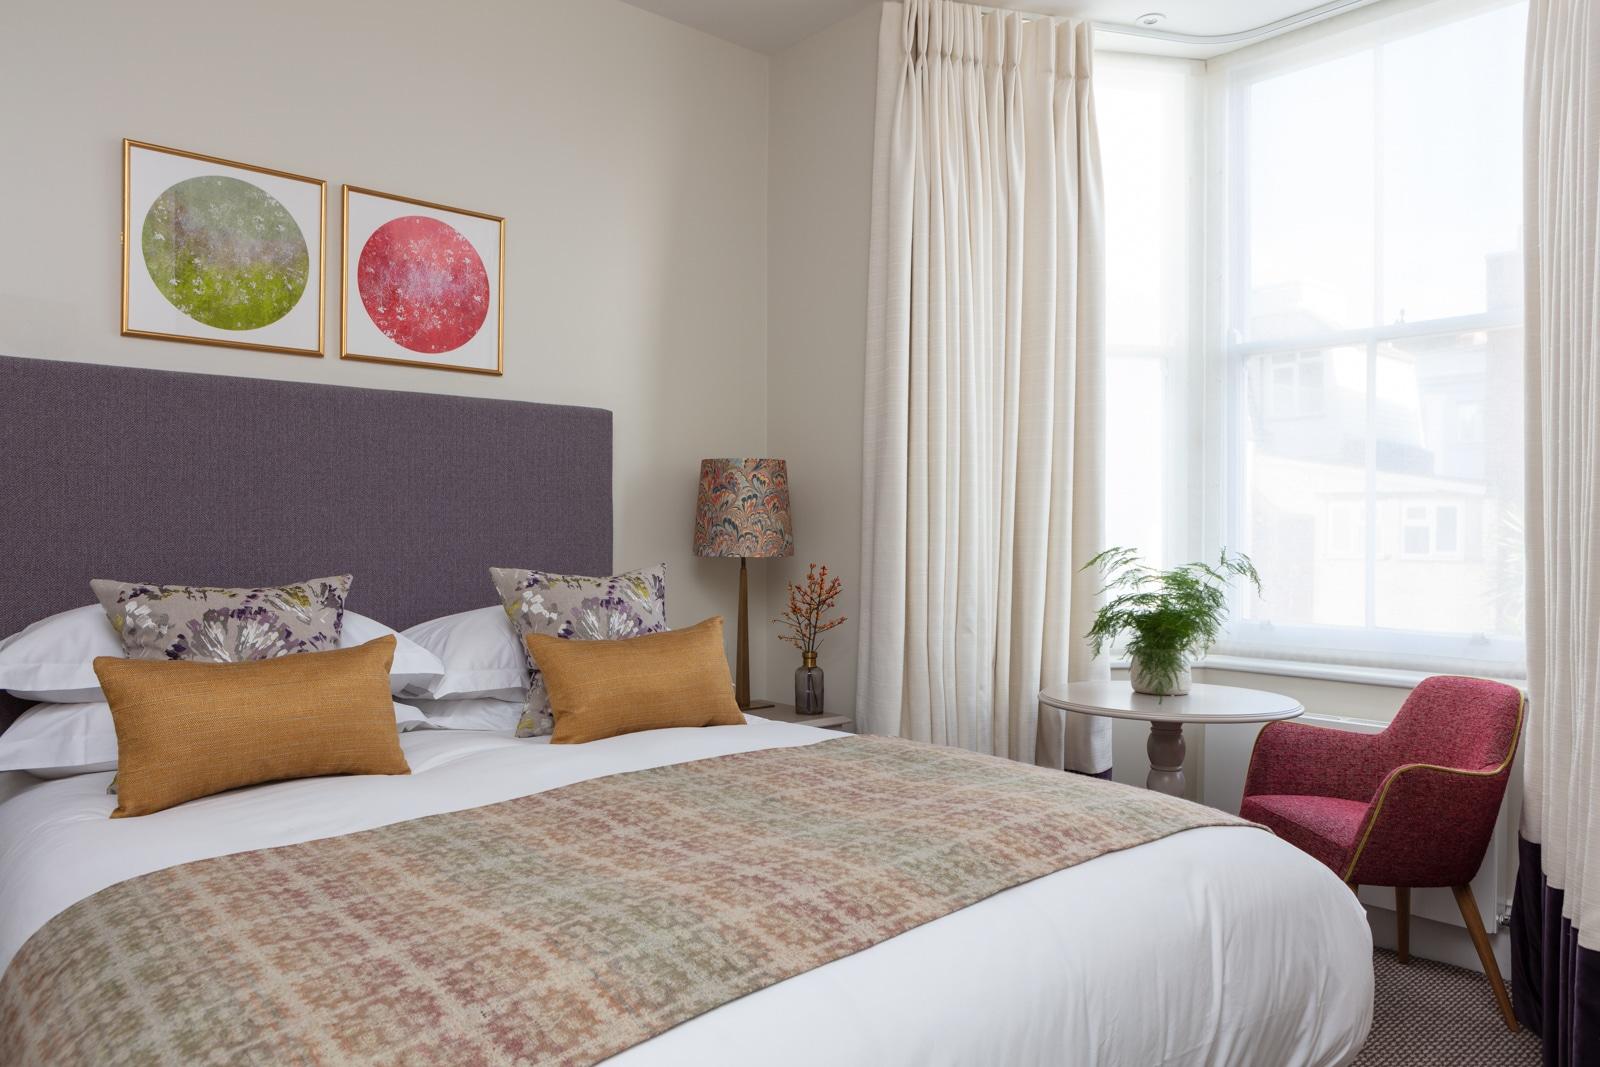 brighton interior design bedroom